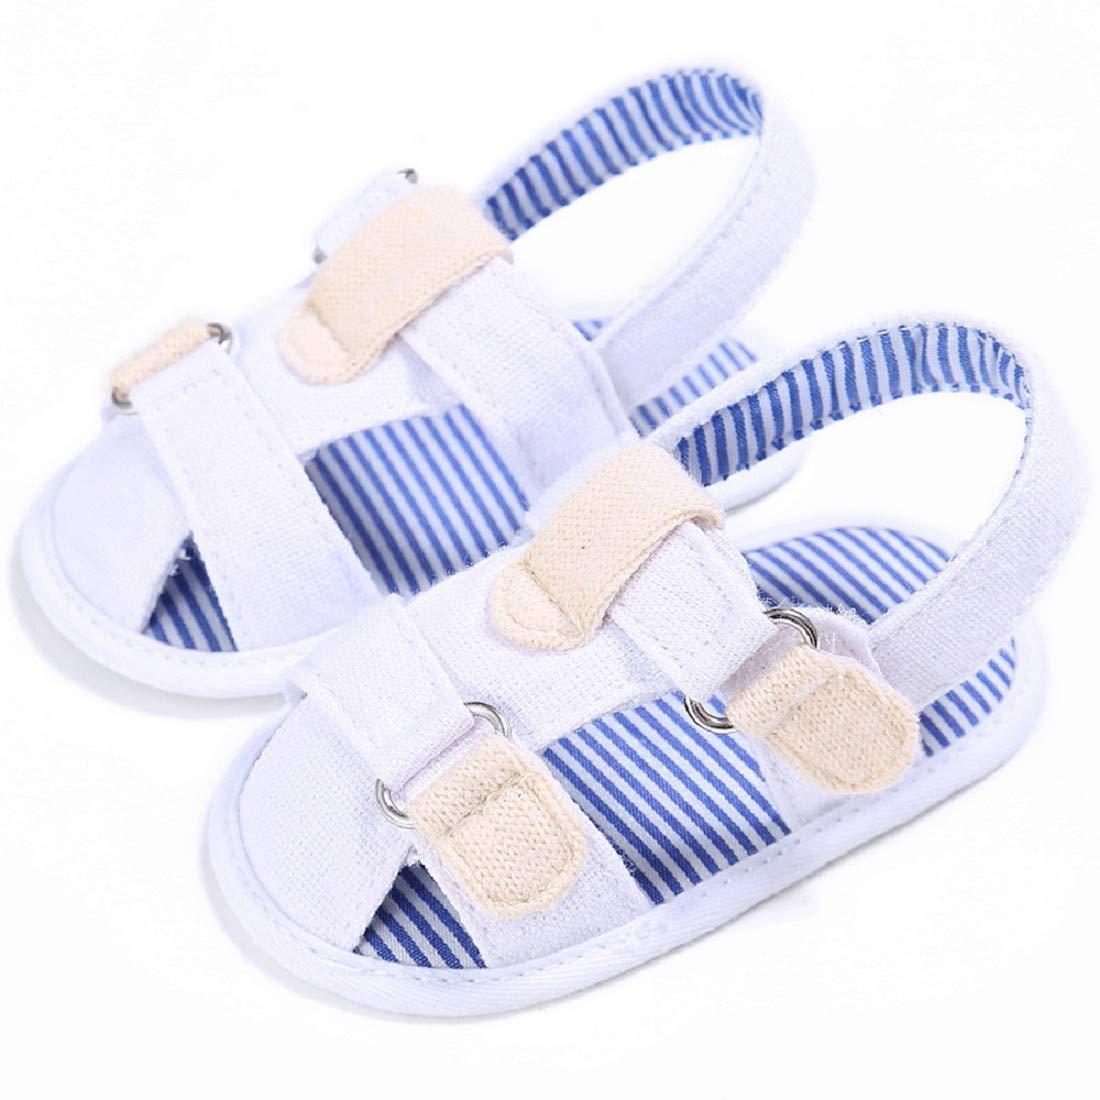 Baby Sandals FAPIZI Canvas Boys Cute Crib Shoes T-Tied Soft Prewalker Soft Bottom Toddler Shoes